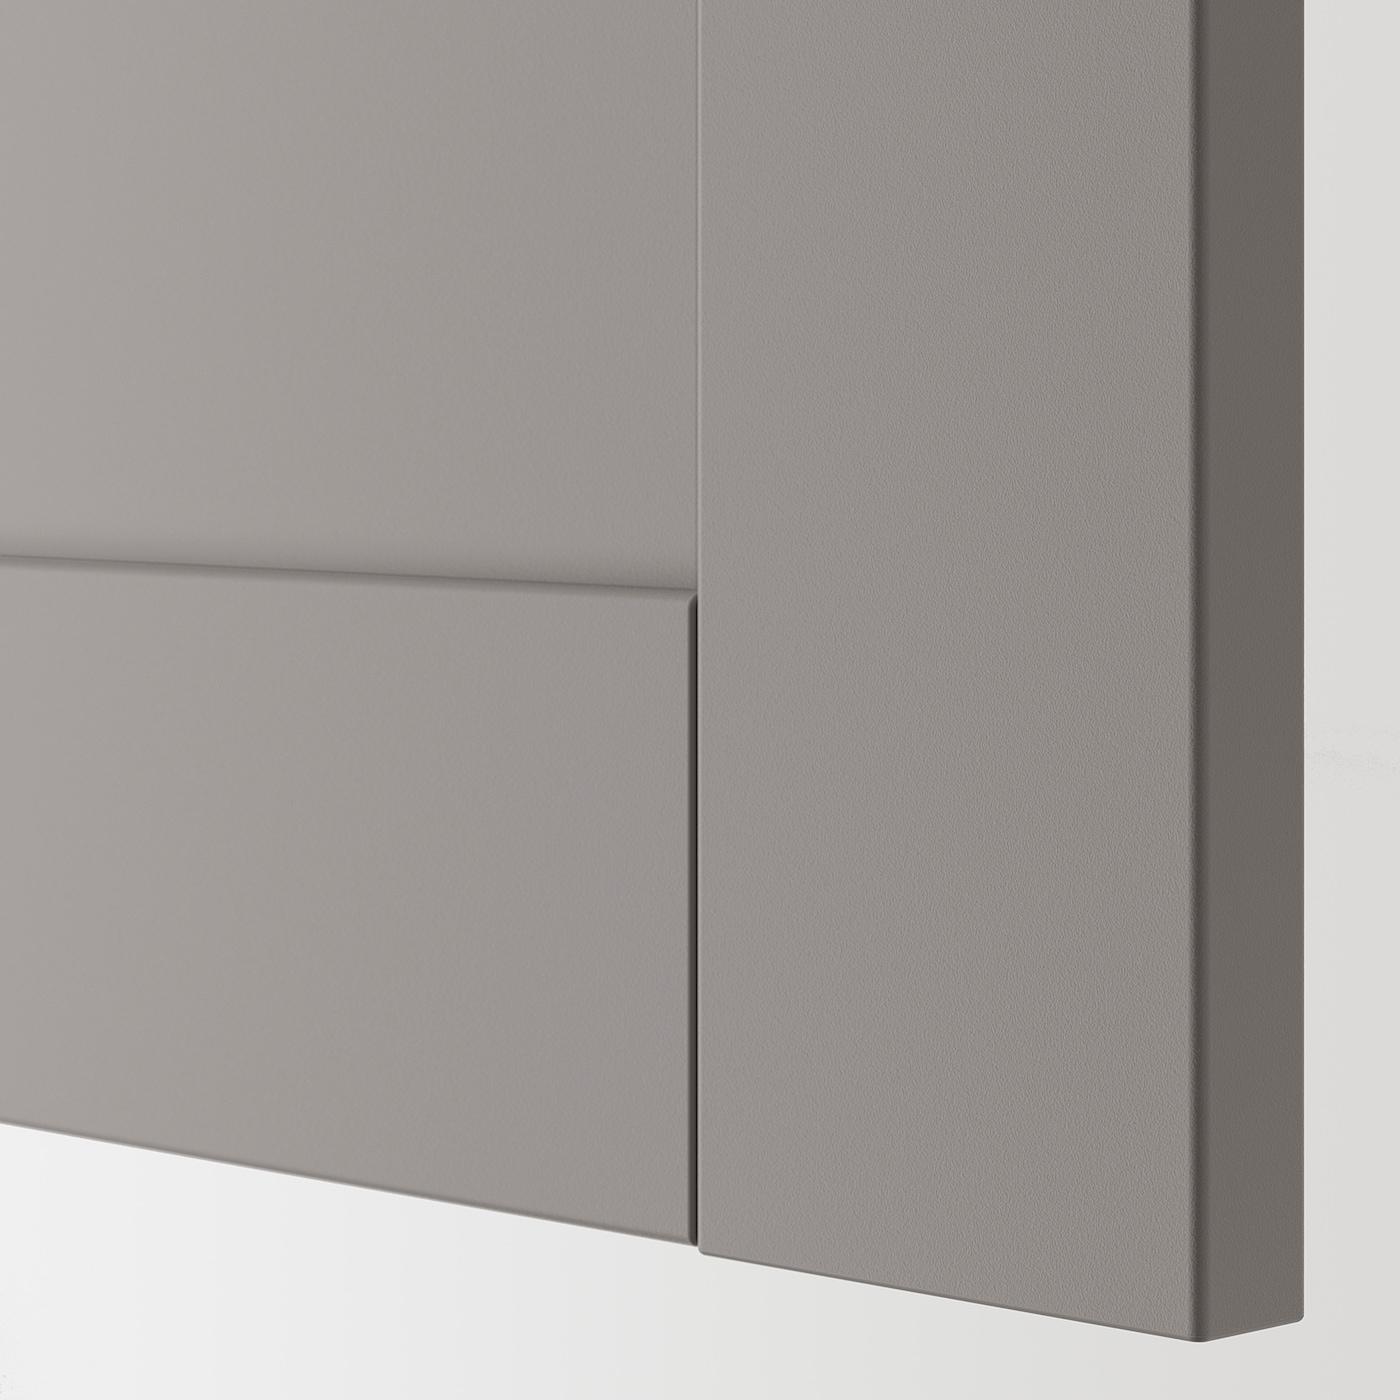 ENHET Onderkast met 3 lades, wit/grijs frame, 40x62x75 cm